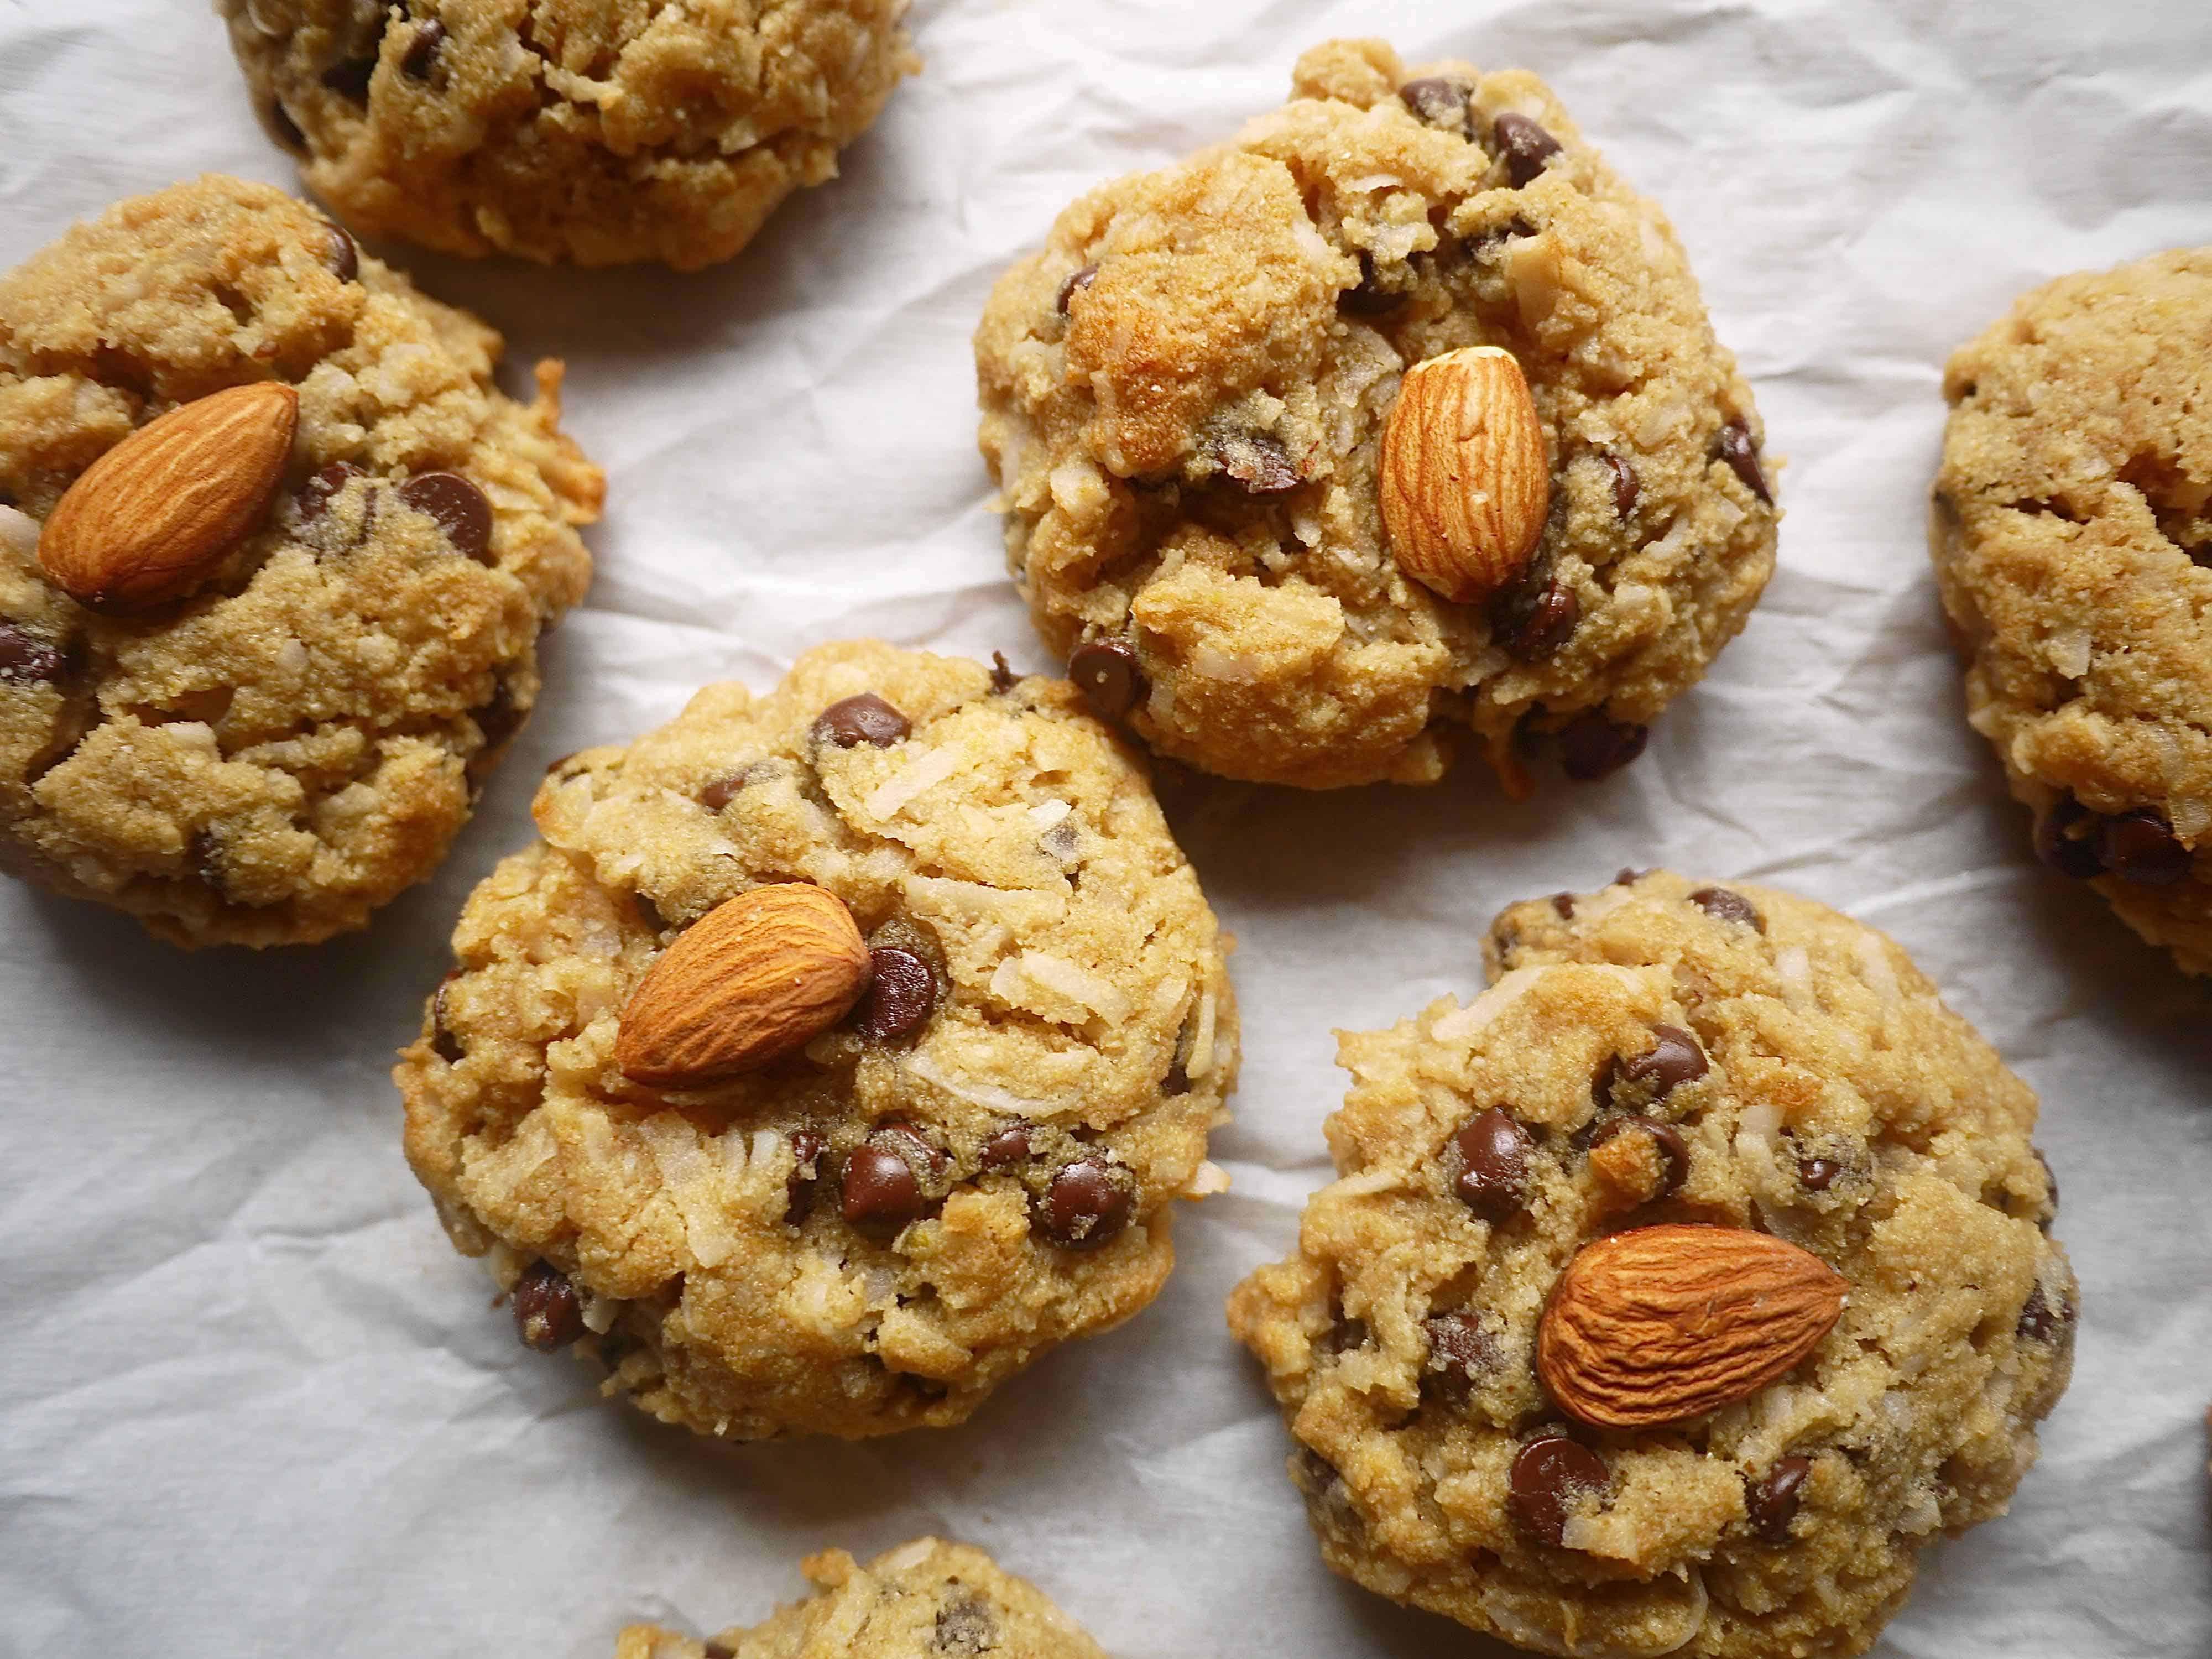 Paleo Almond Joy Cookies (GF)  Perchance to Cook, www.perchancetocook.com